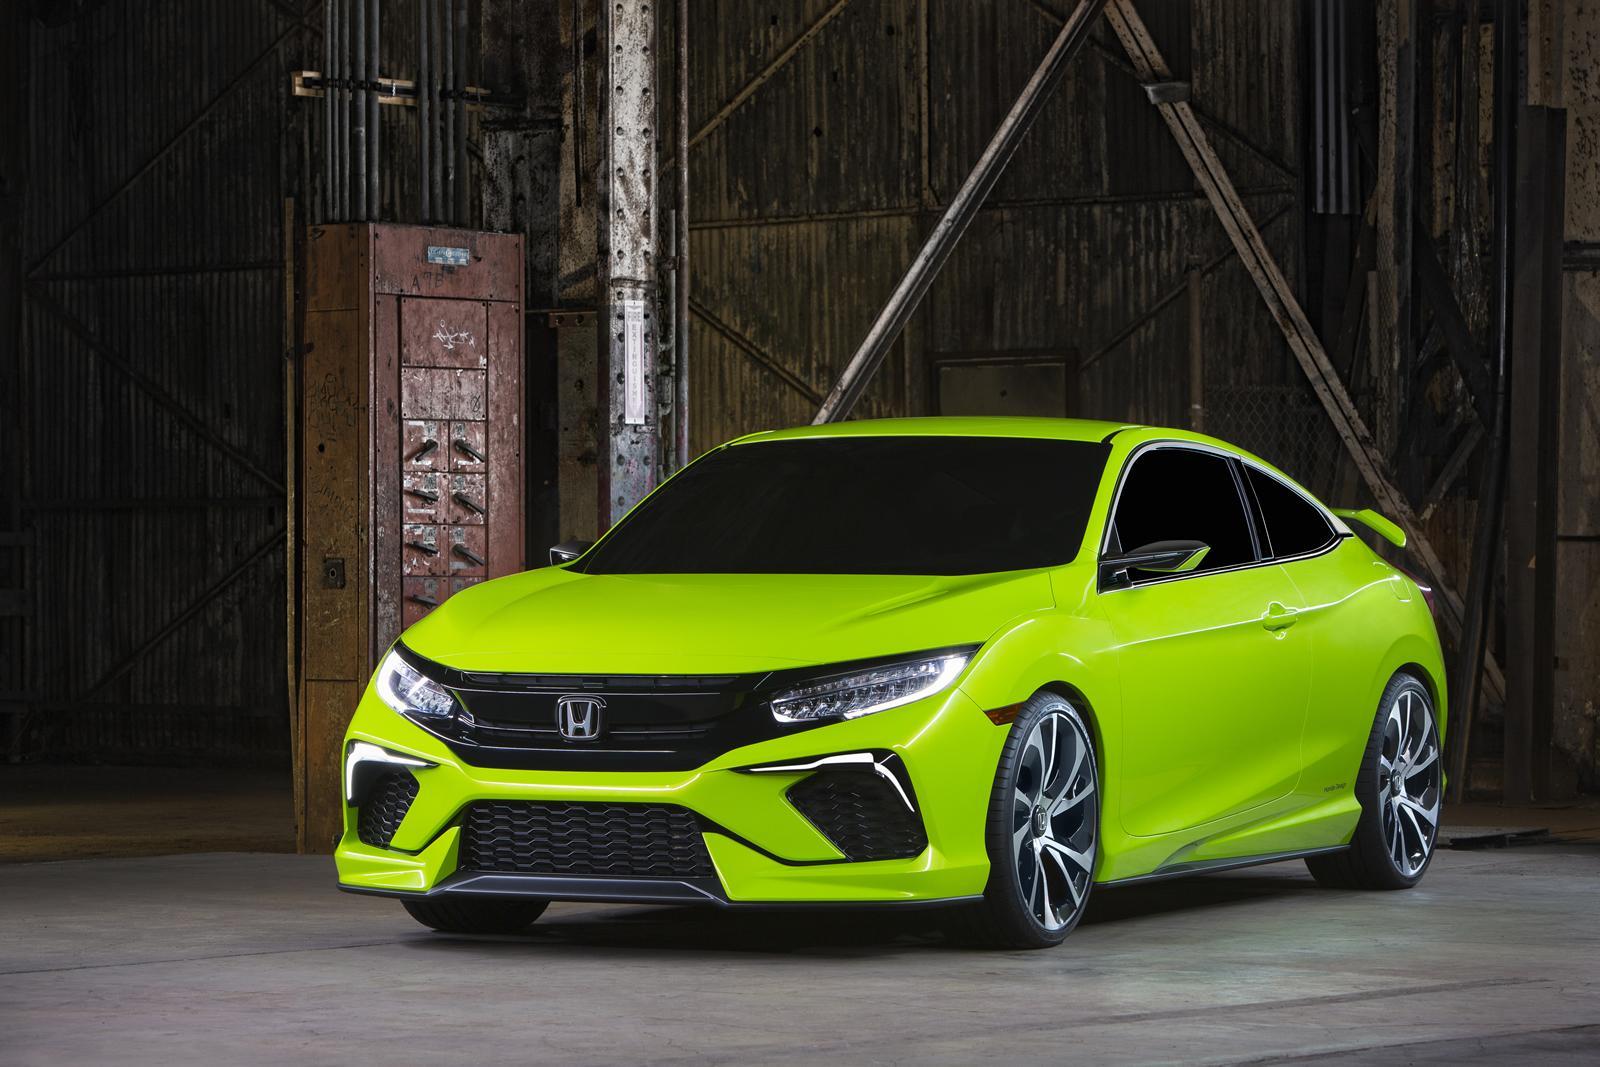 Honda Civic Concept 2015